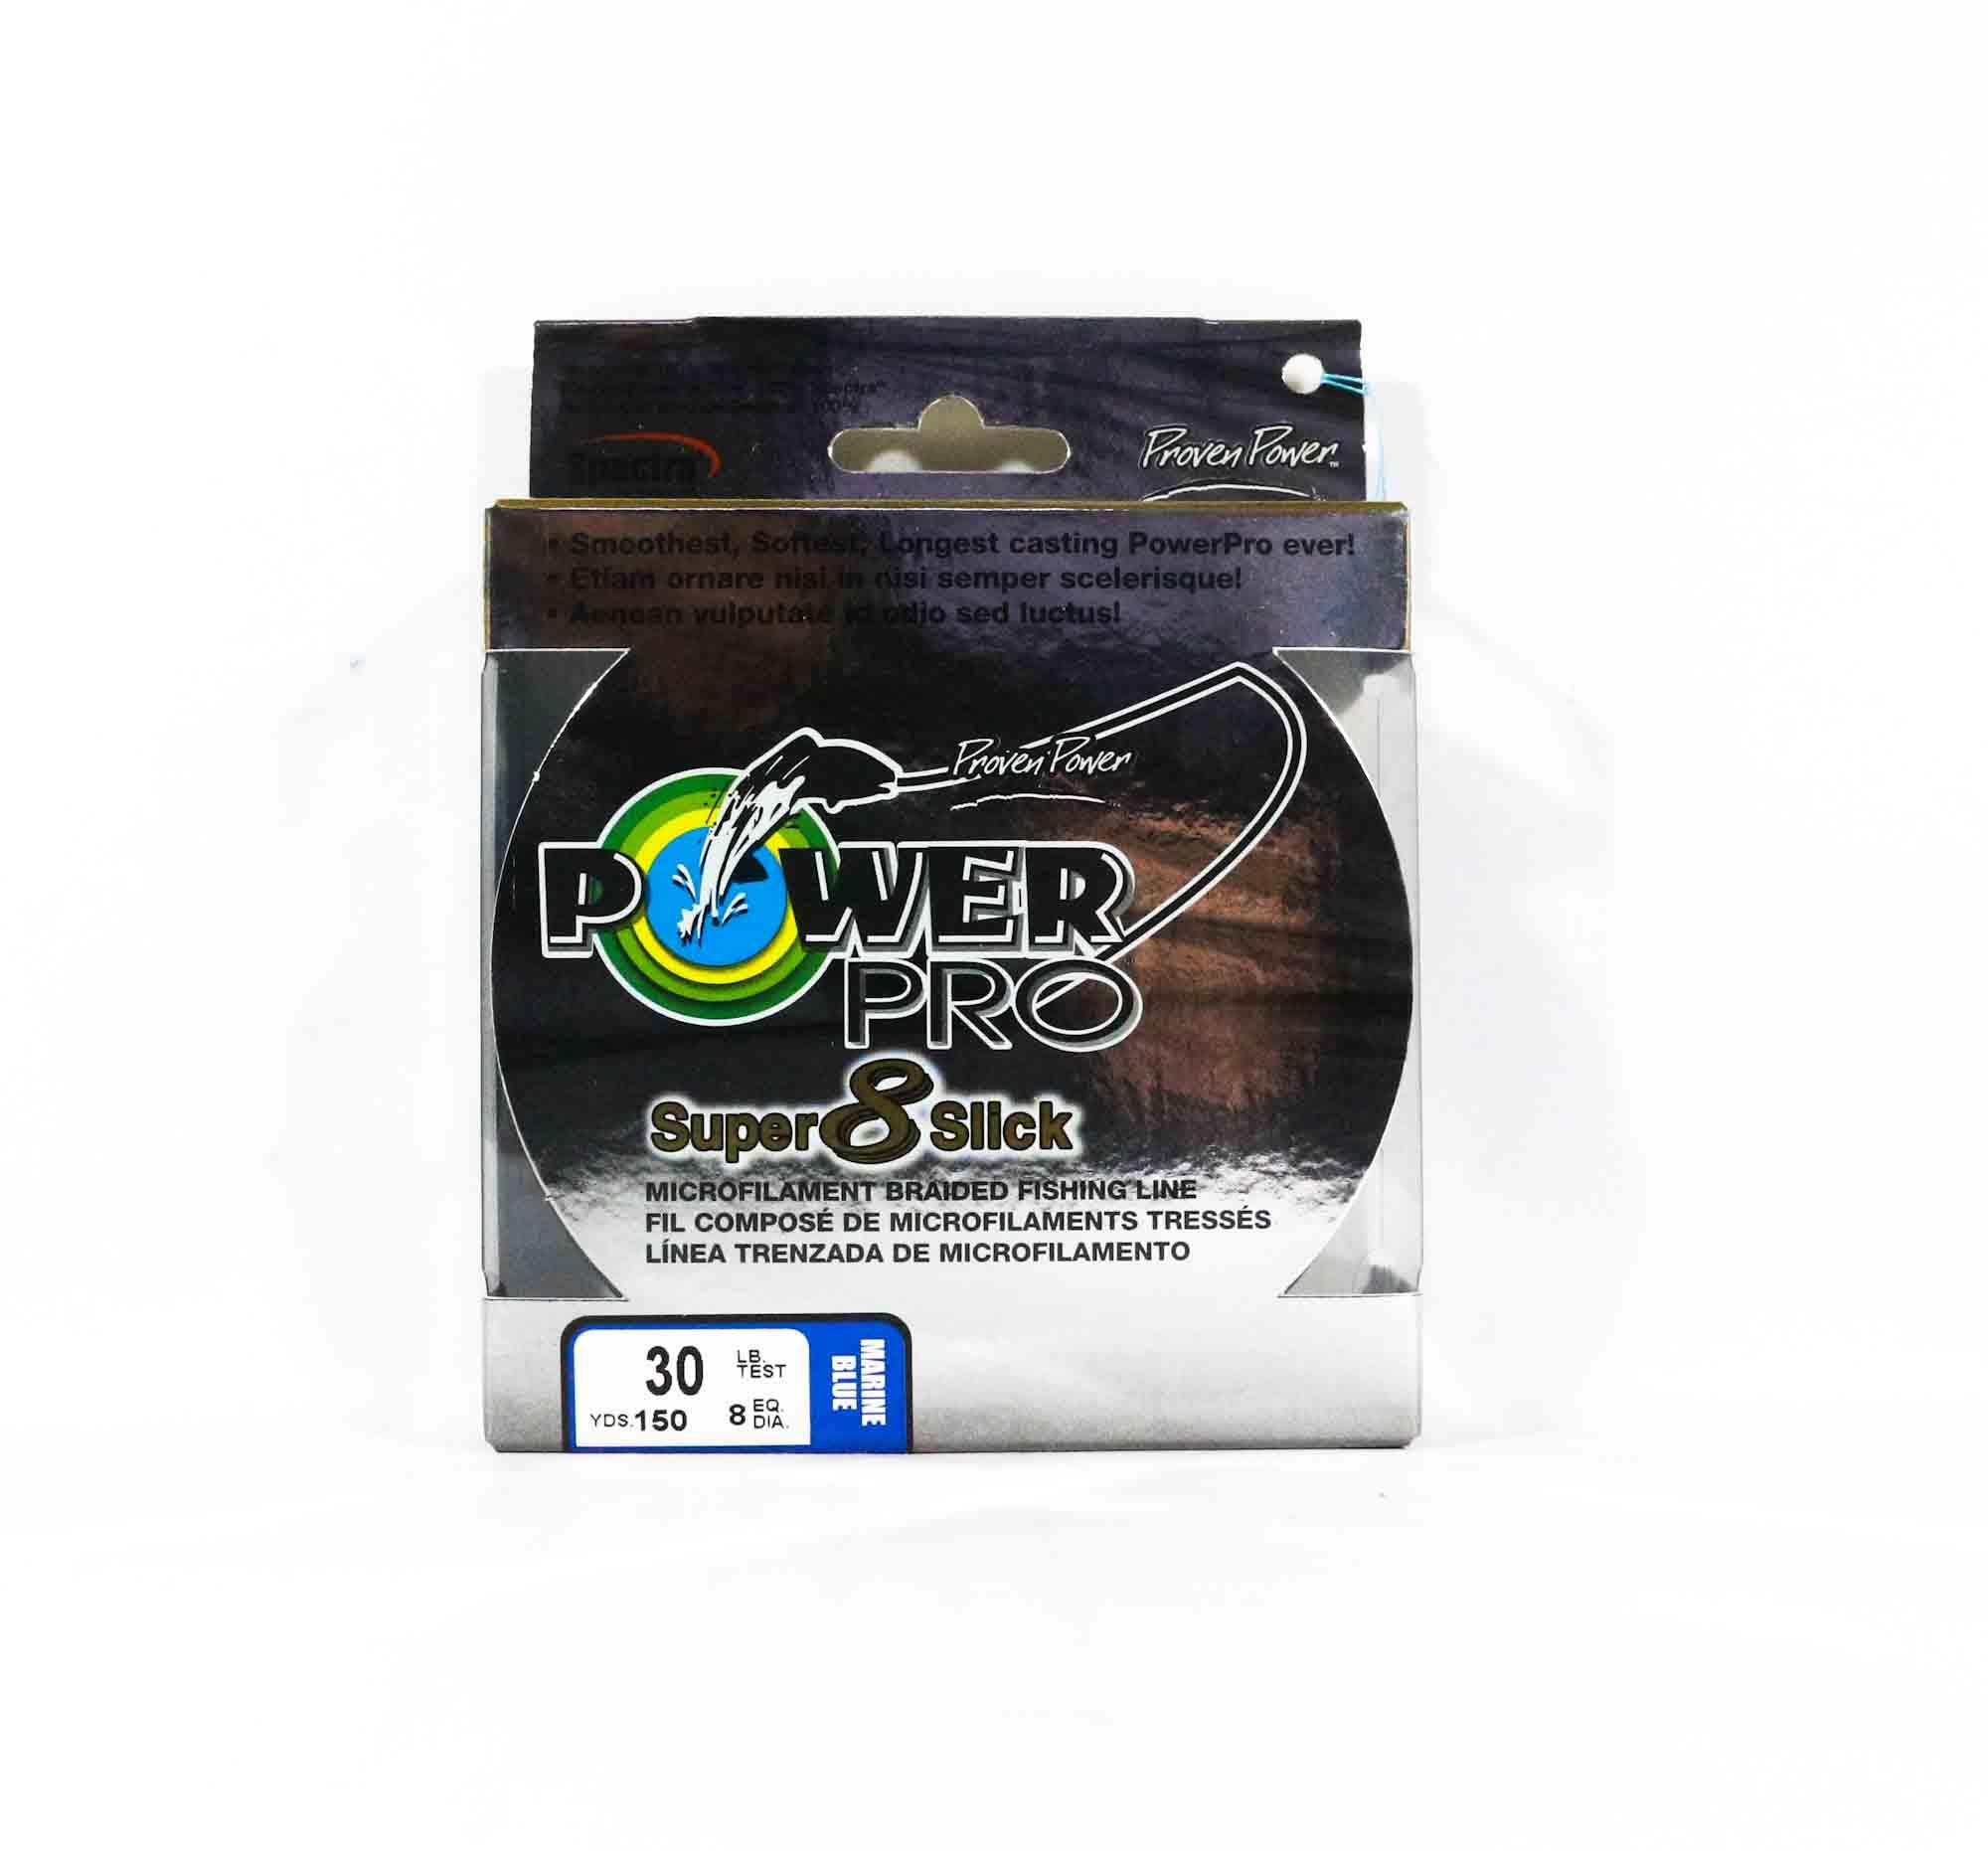 Power Pro Super 8 Slick Spectra Line 30lb by 150yds Blue (0169)